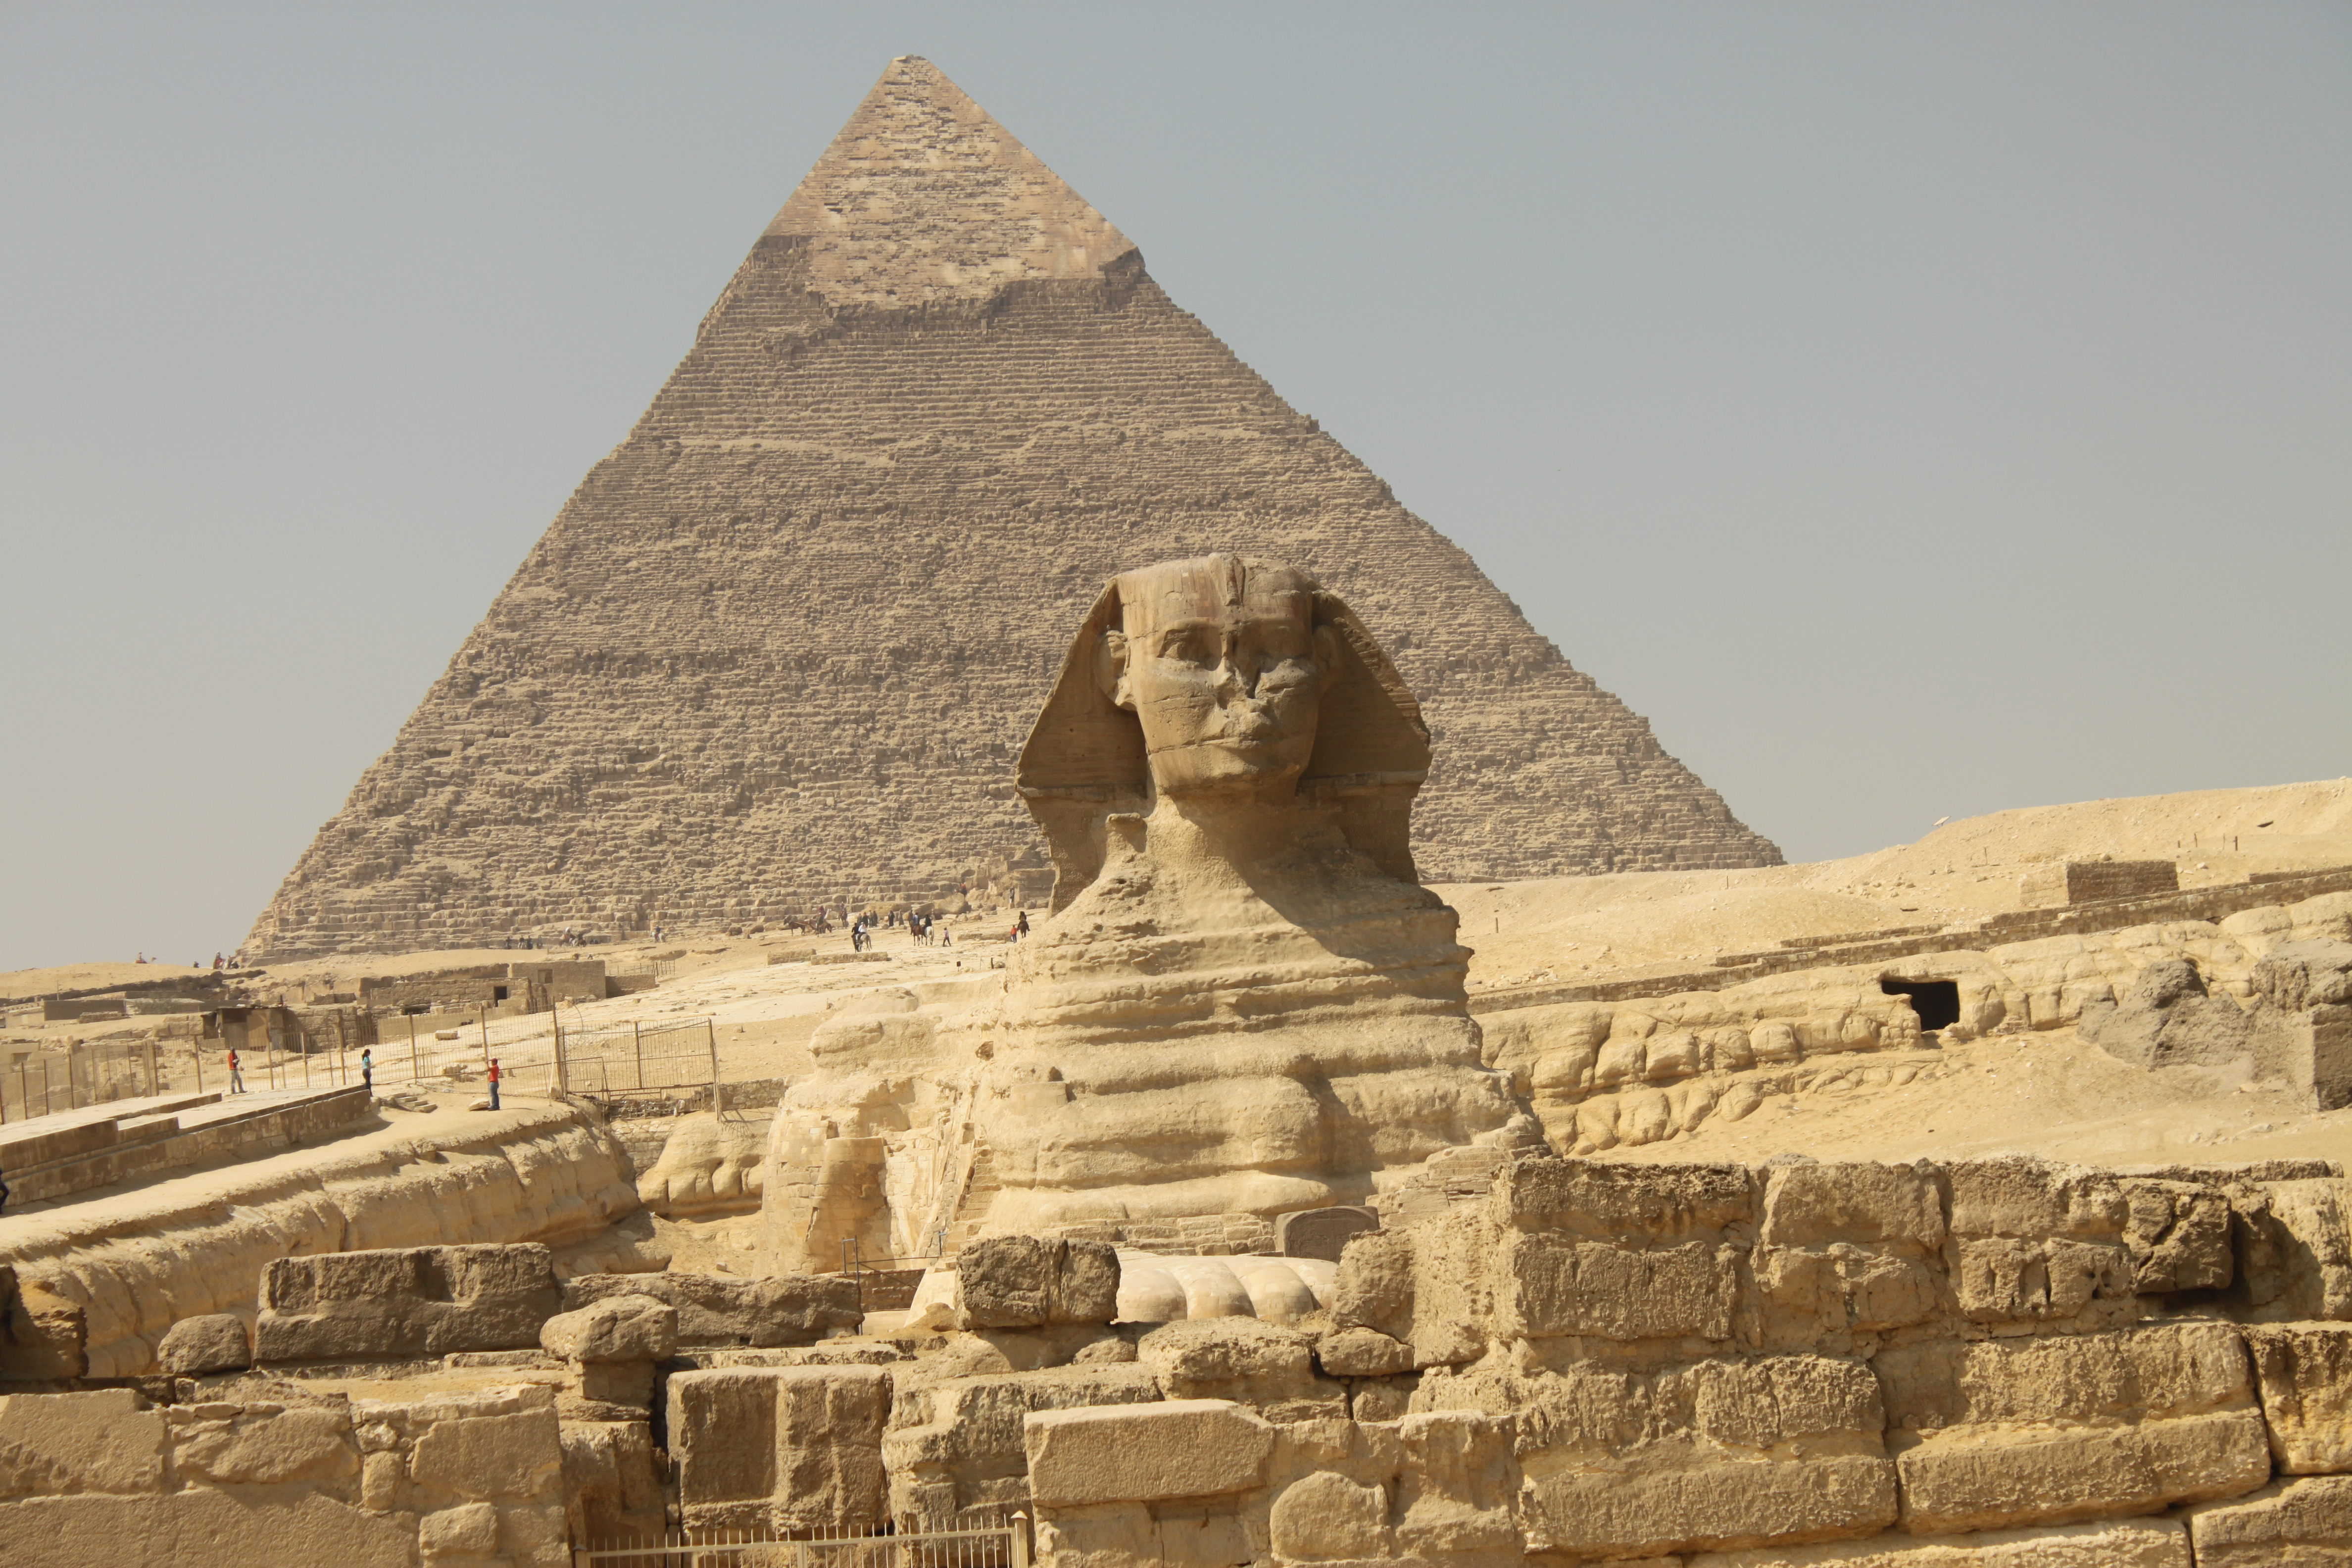 Image source: https://globetrotter30.files.wordpress.com/2012/08/img_5517.jpg